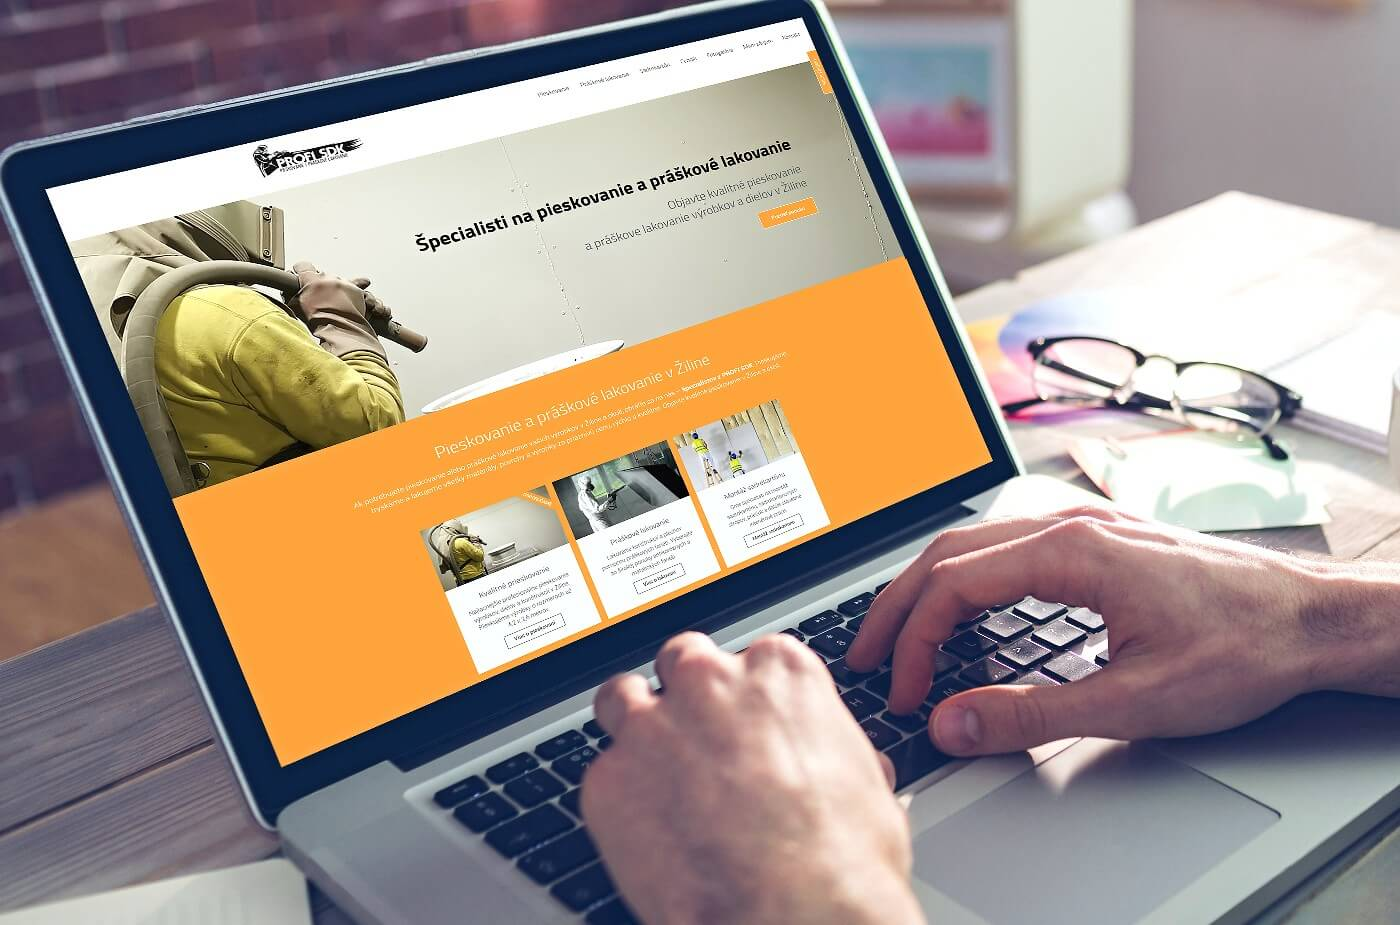 Tvorba web stránok pre firmu www.profisdk.sk | Webovica.sk